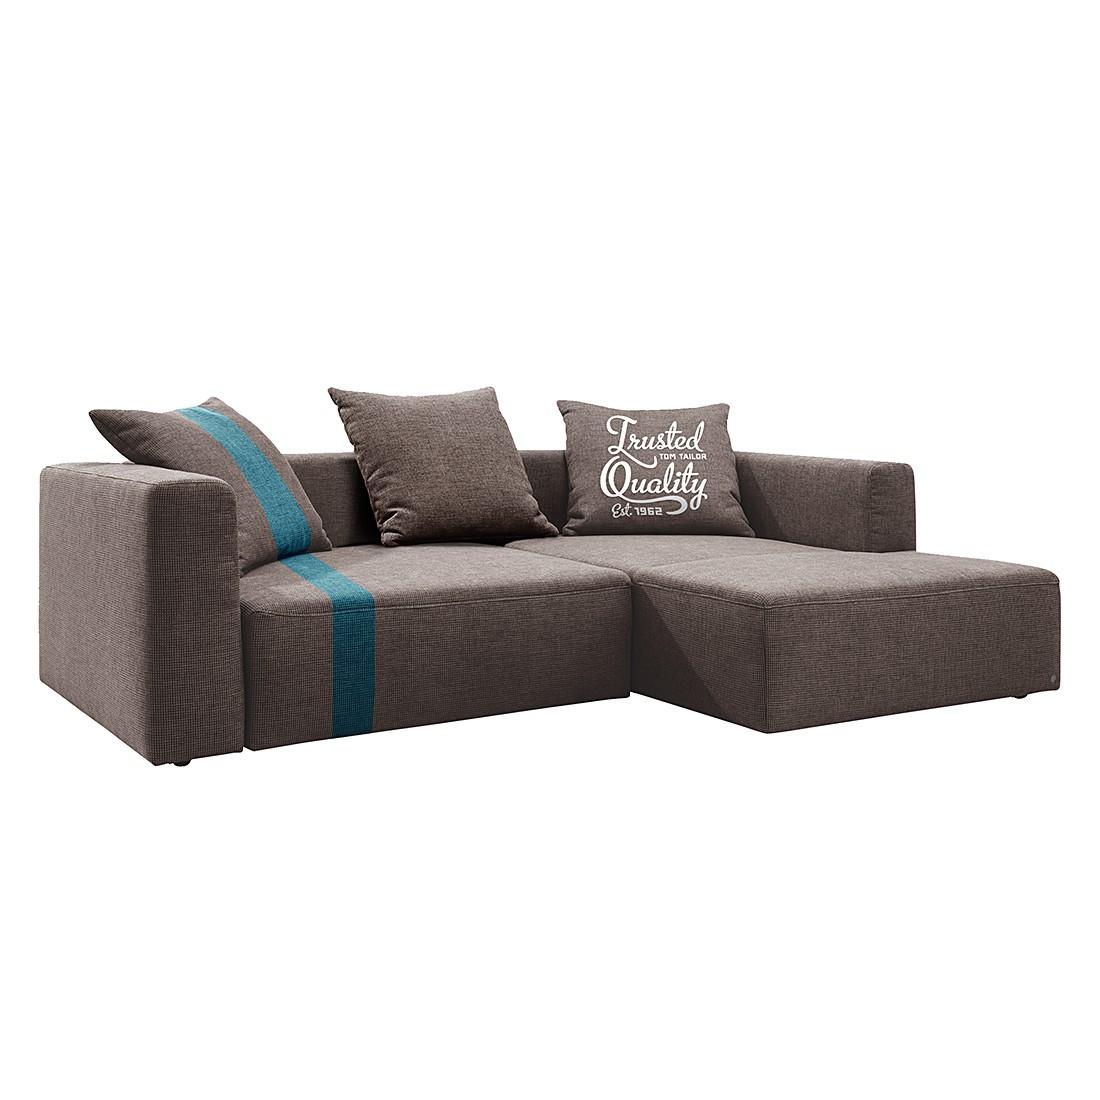 Canapé d'angle Heaven Stripe